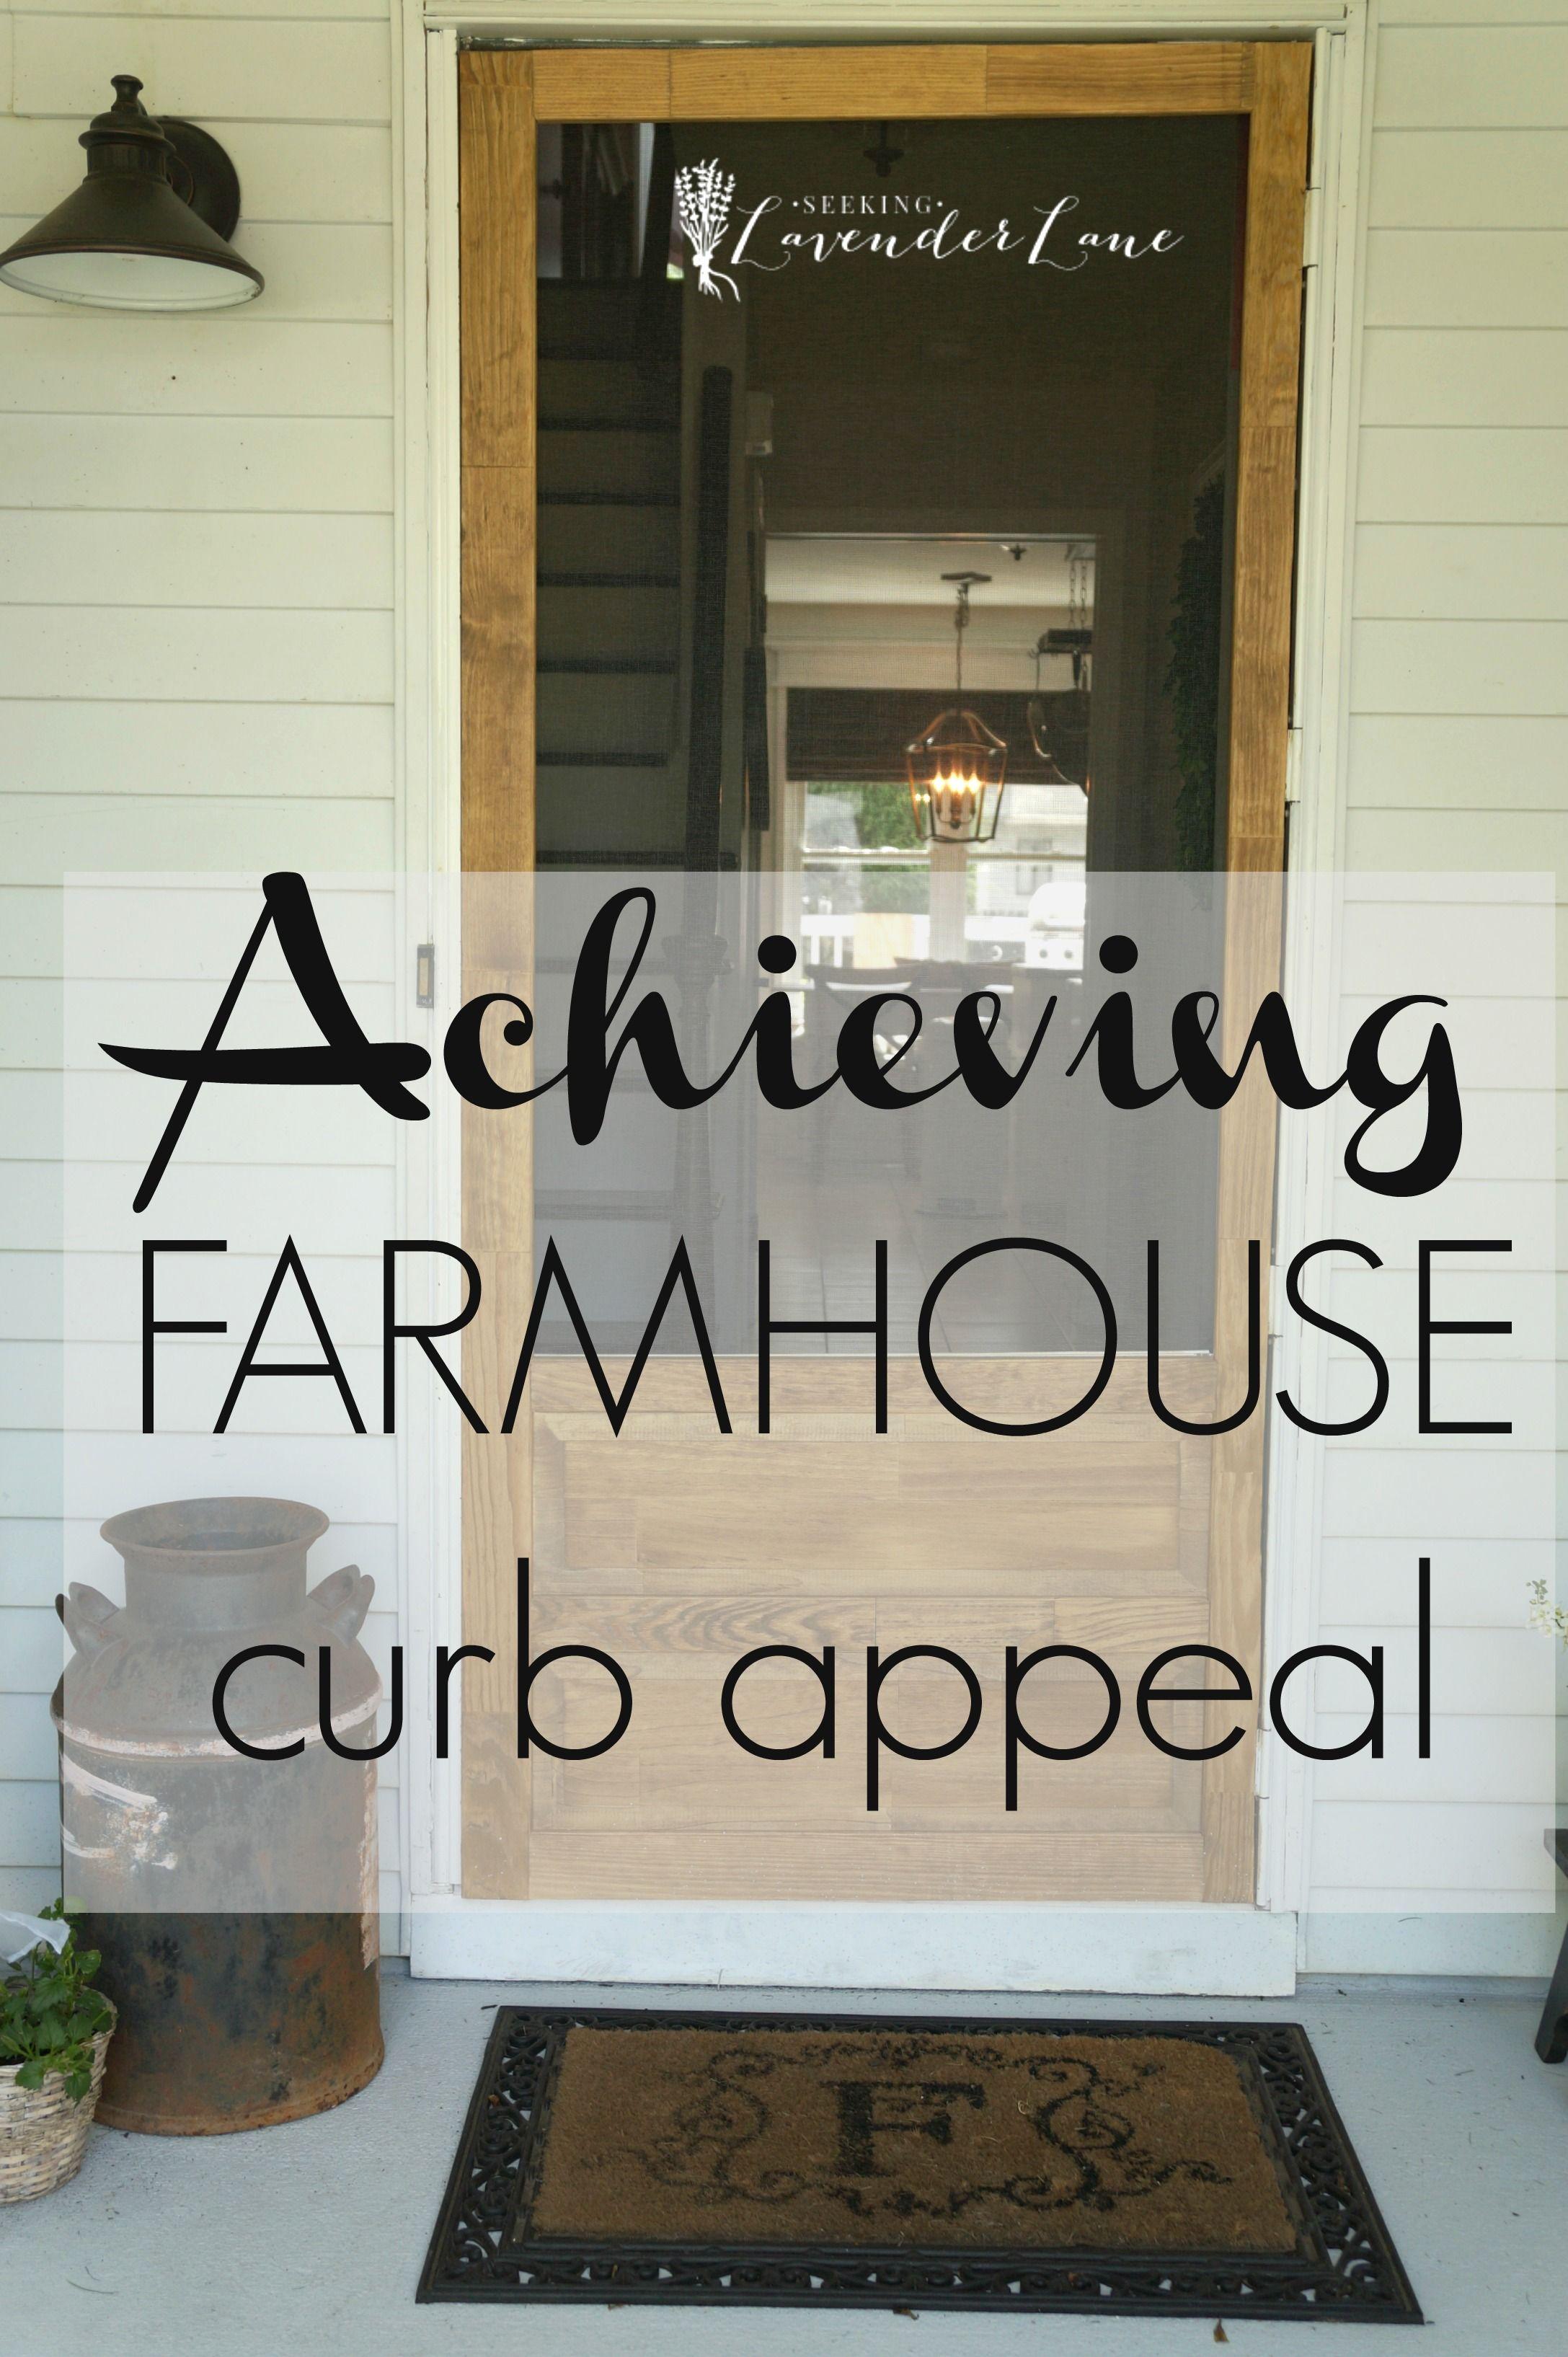 Front Yard Landscaping Ideas Achieving Farmhouse Curb Appeal Farmhouse Outdoor Decor Farmhouse Landscaping Curb Appeal